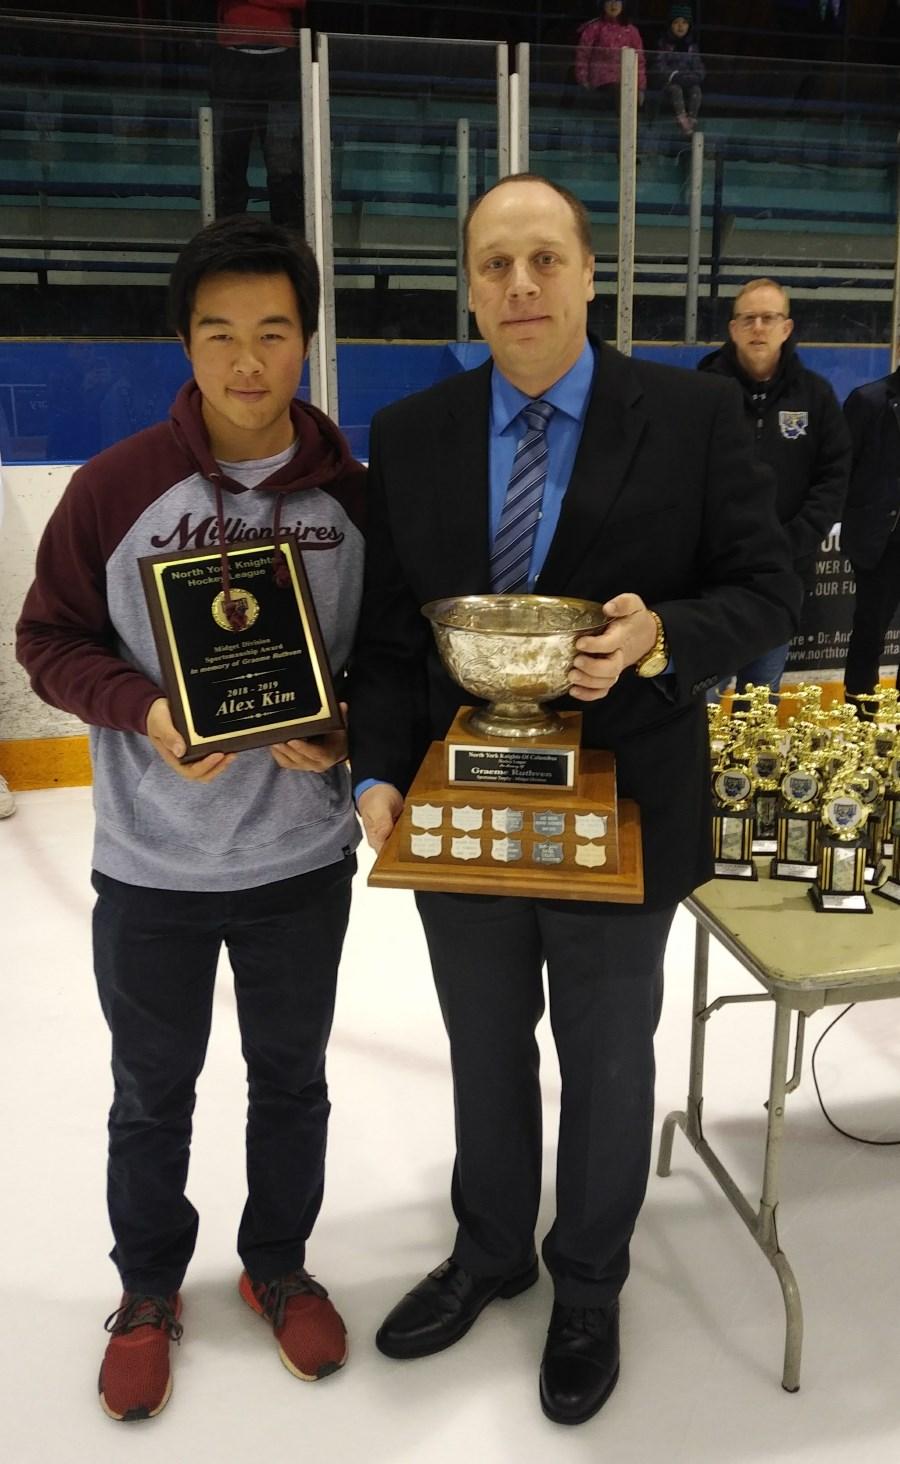 Ruthven Award - Alex KimRuthven Award - Alex Kim